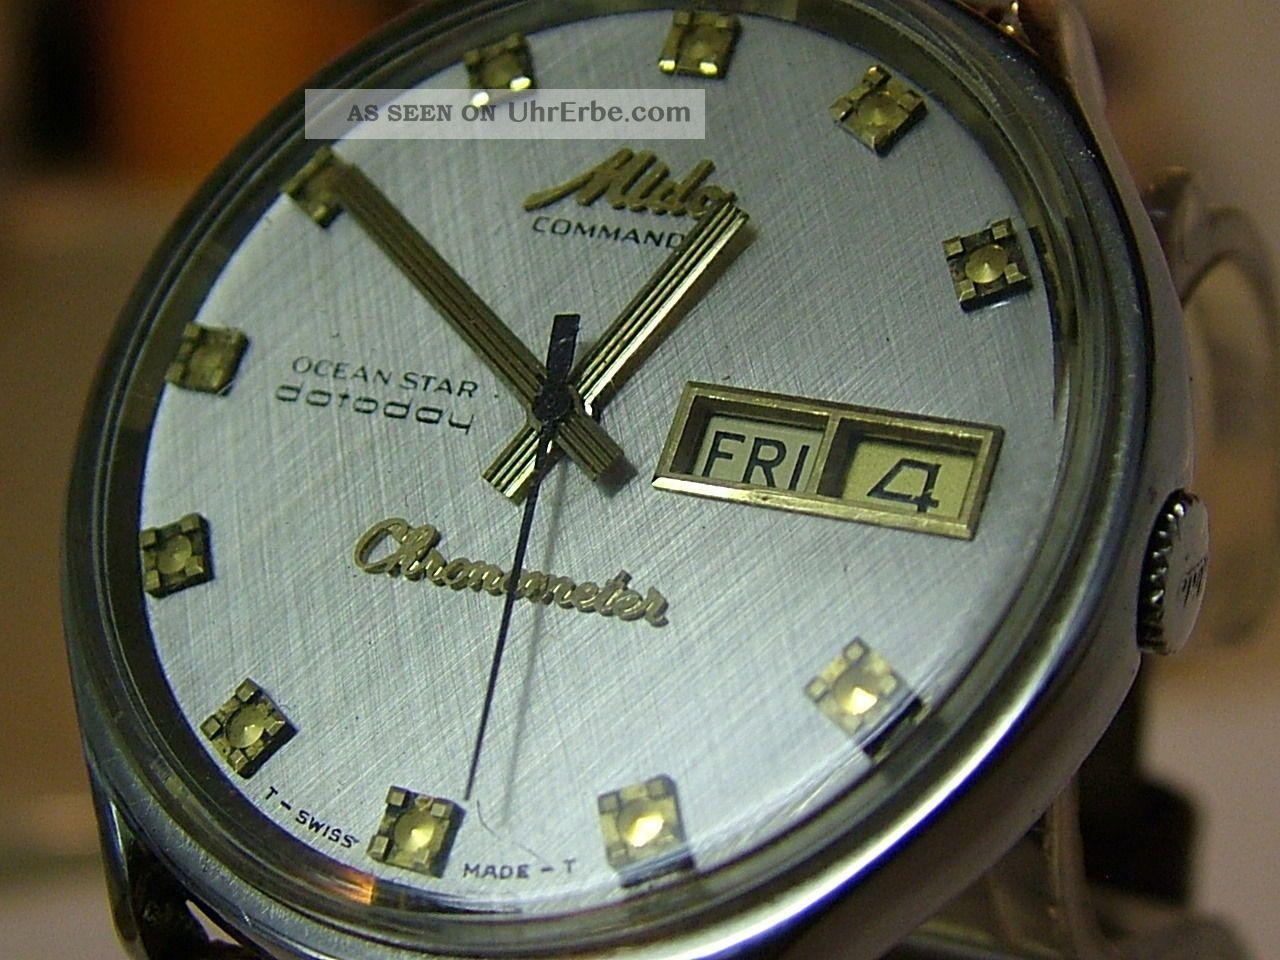 Mido Chronometer Armbanduhren Bild